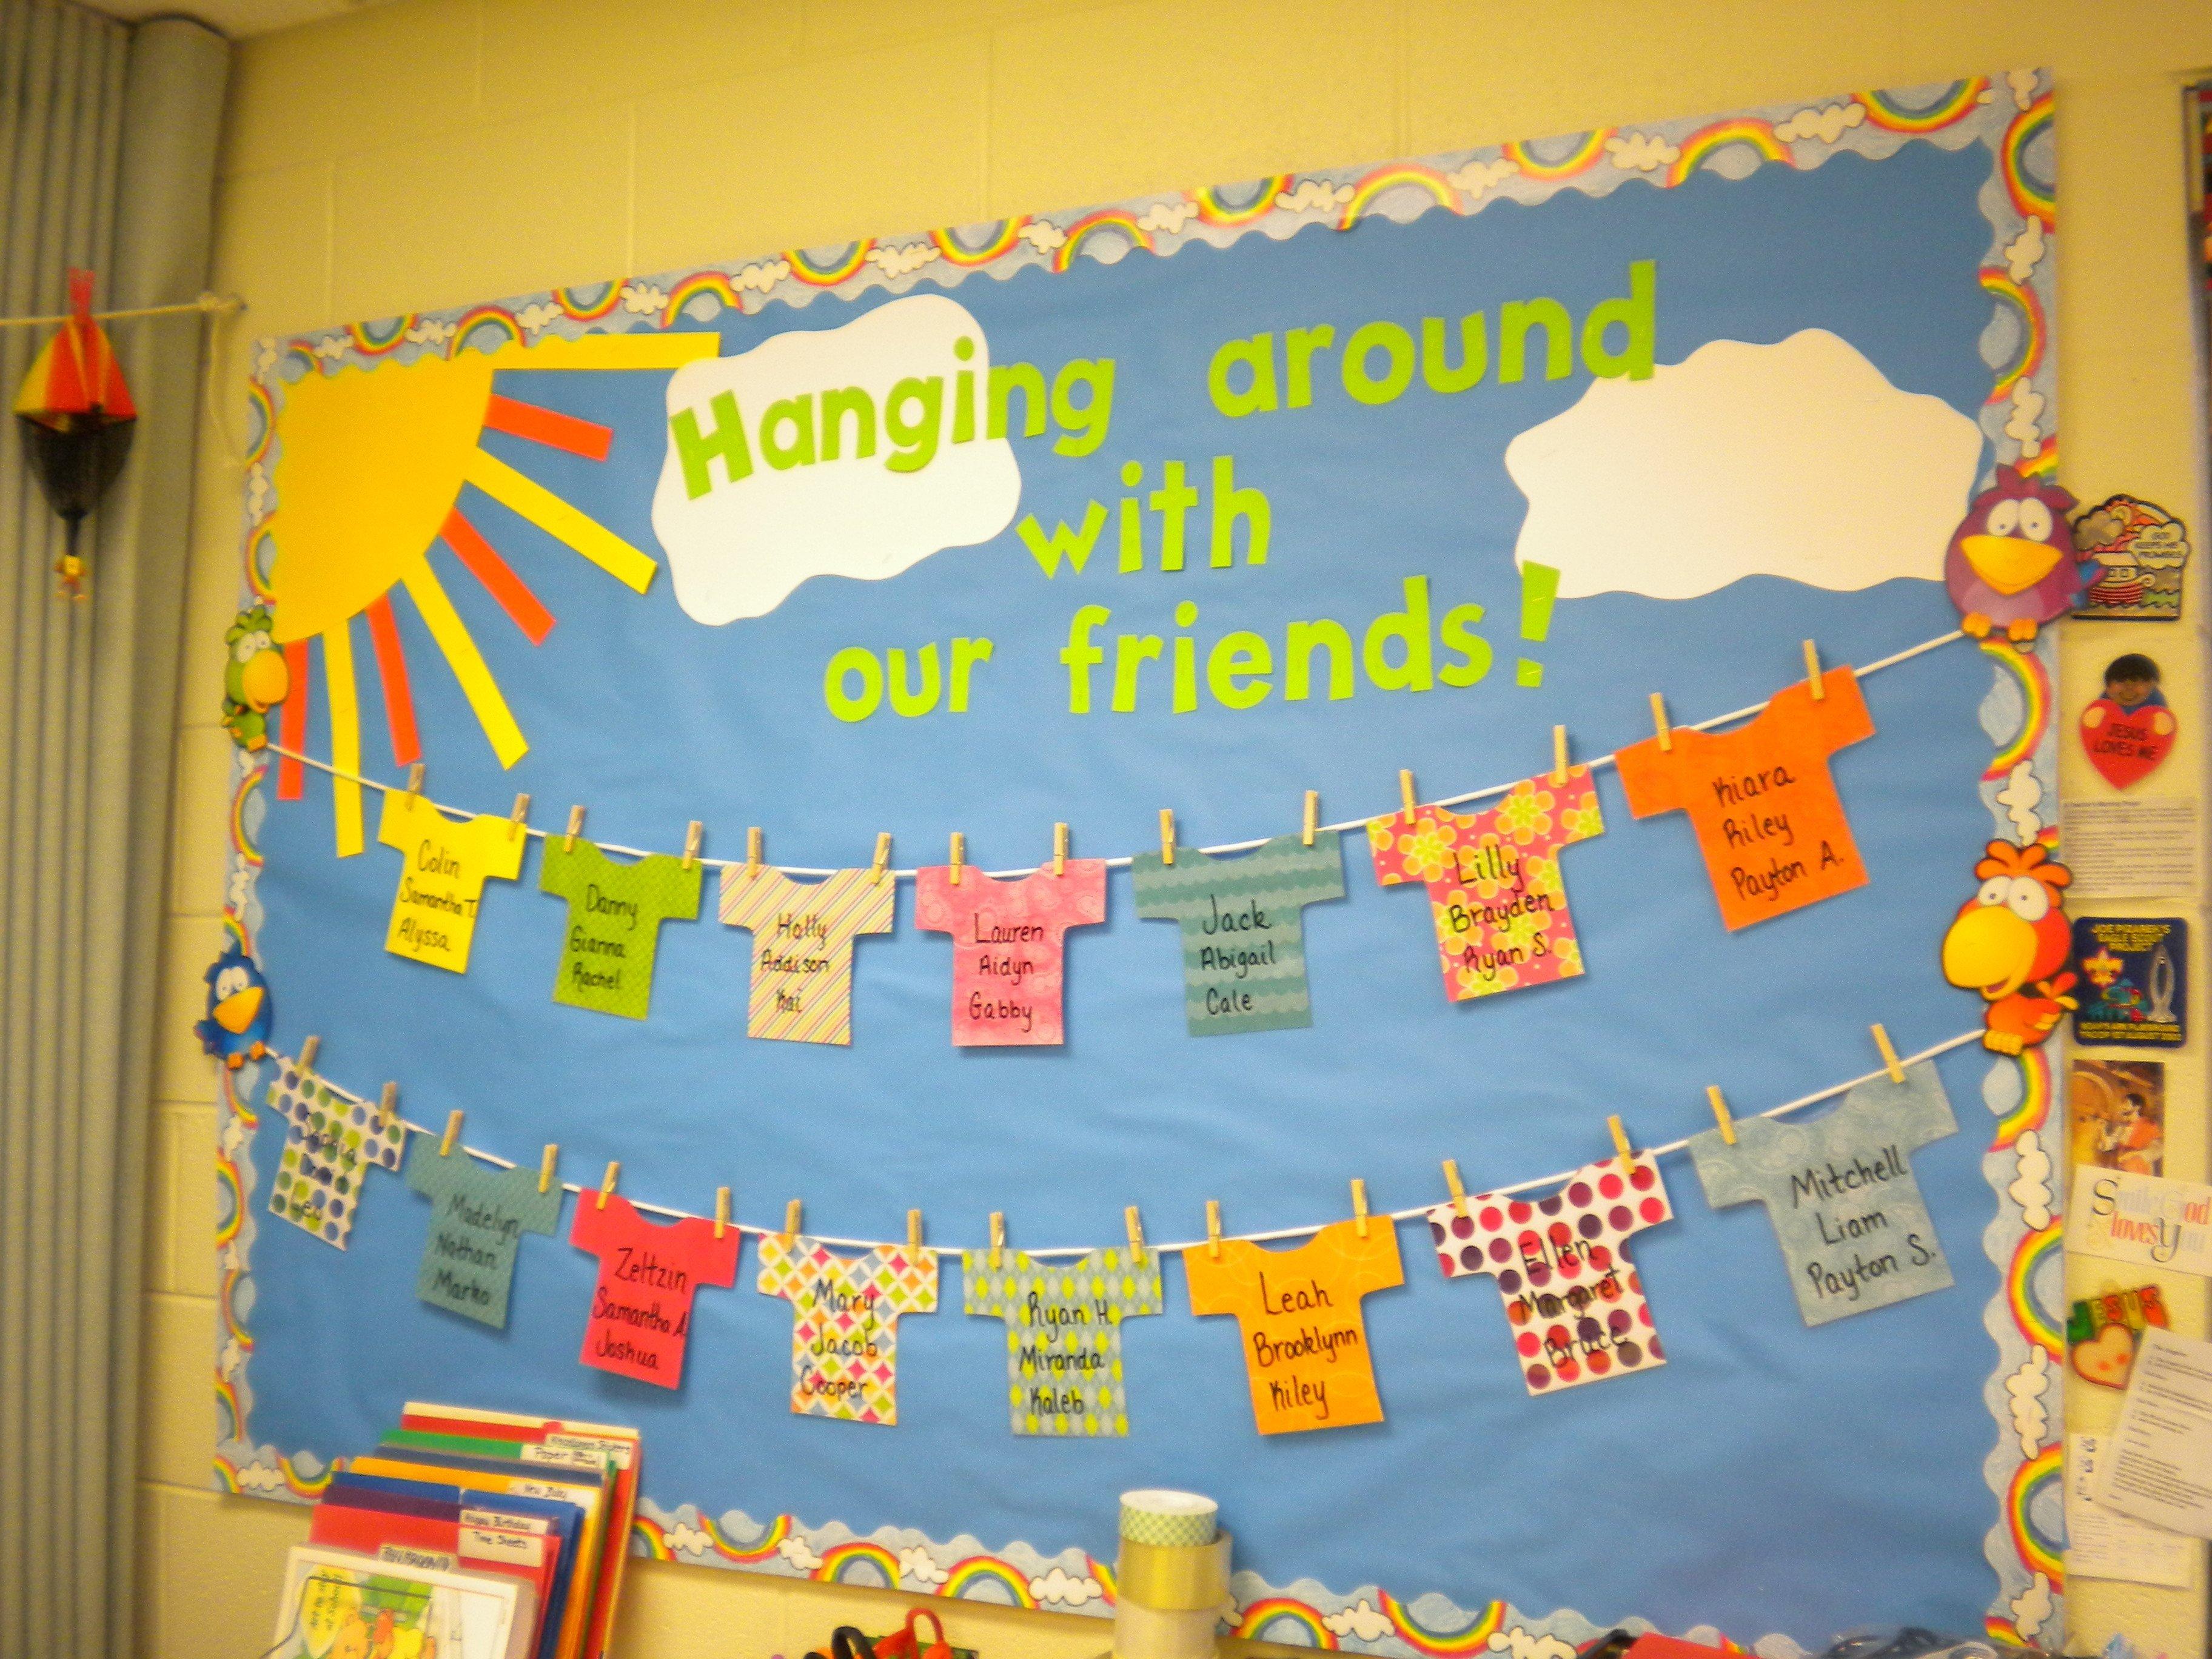 March Bulletin Board Ideas Part - 18: 10 Stylish Preschool March Bulletin Board Ideas school preschool playtime